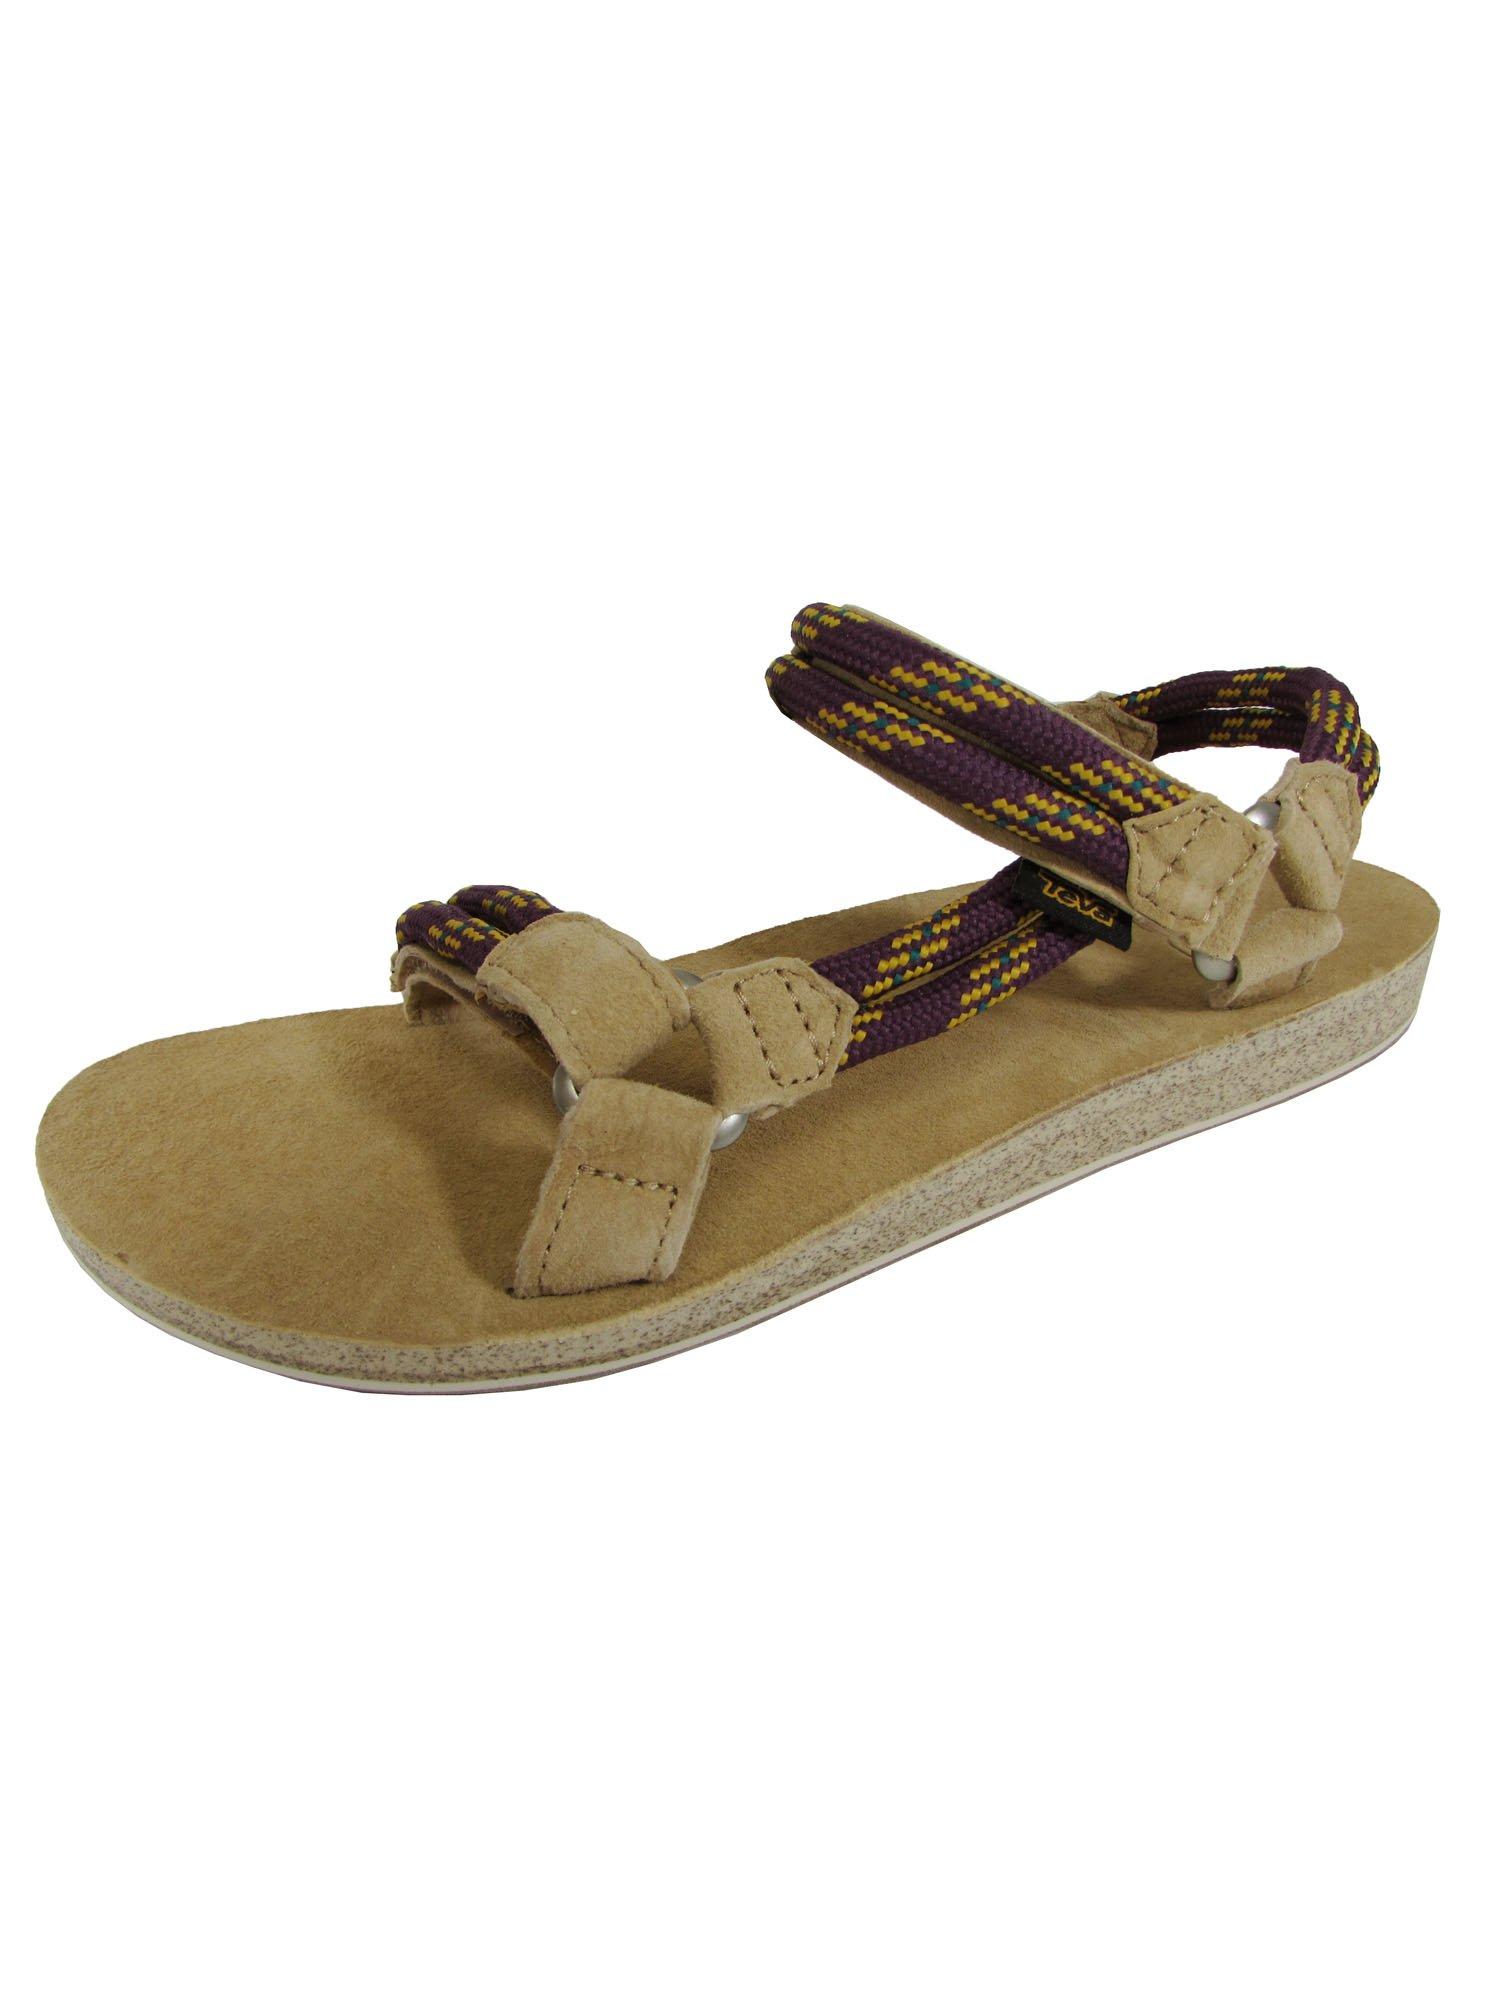 Teva Womens Original Universal Rope Sport Sandal Shoes, Dark Purple, US 11